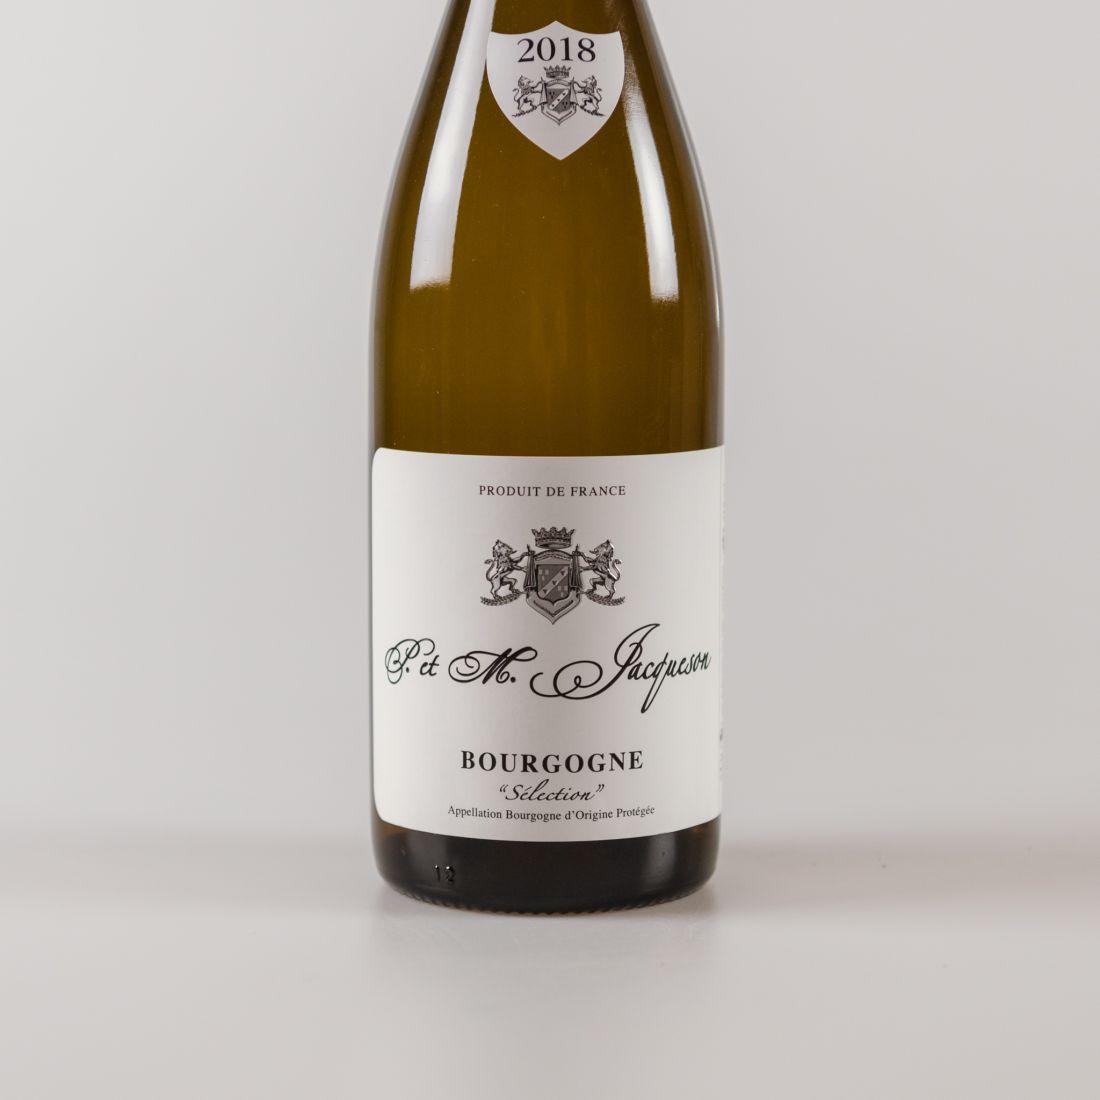 bourgogne selection chardonnay